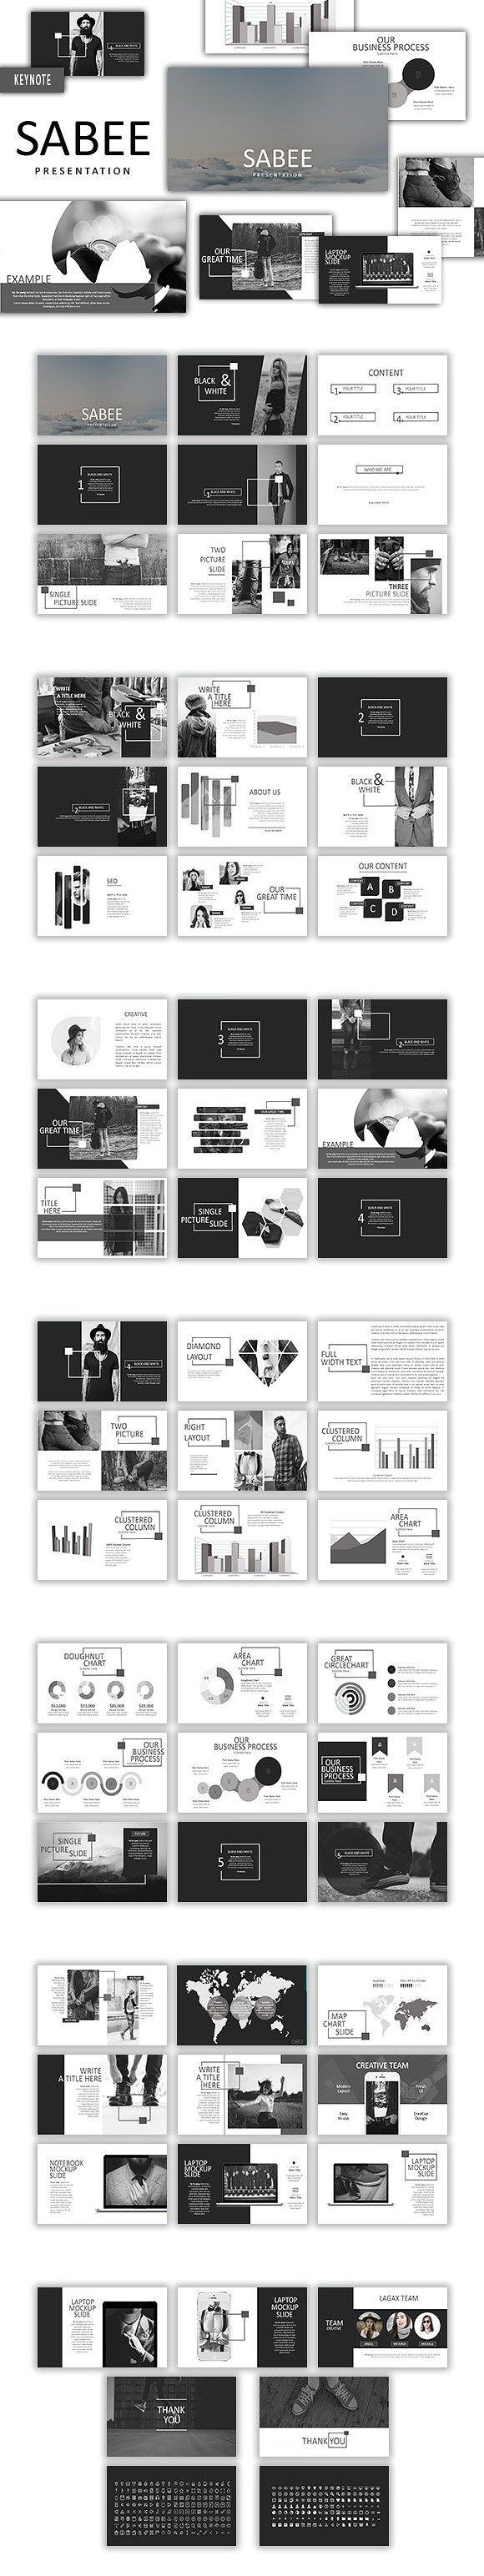 Sabee Keynote Template. Presentation Templates